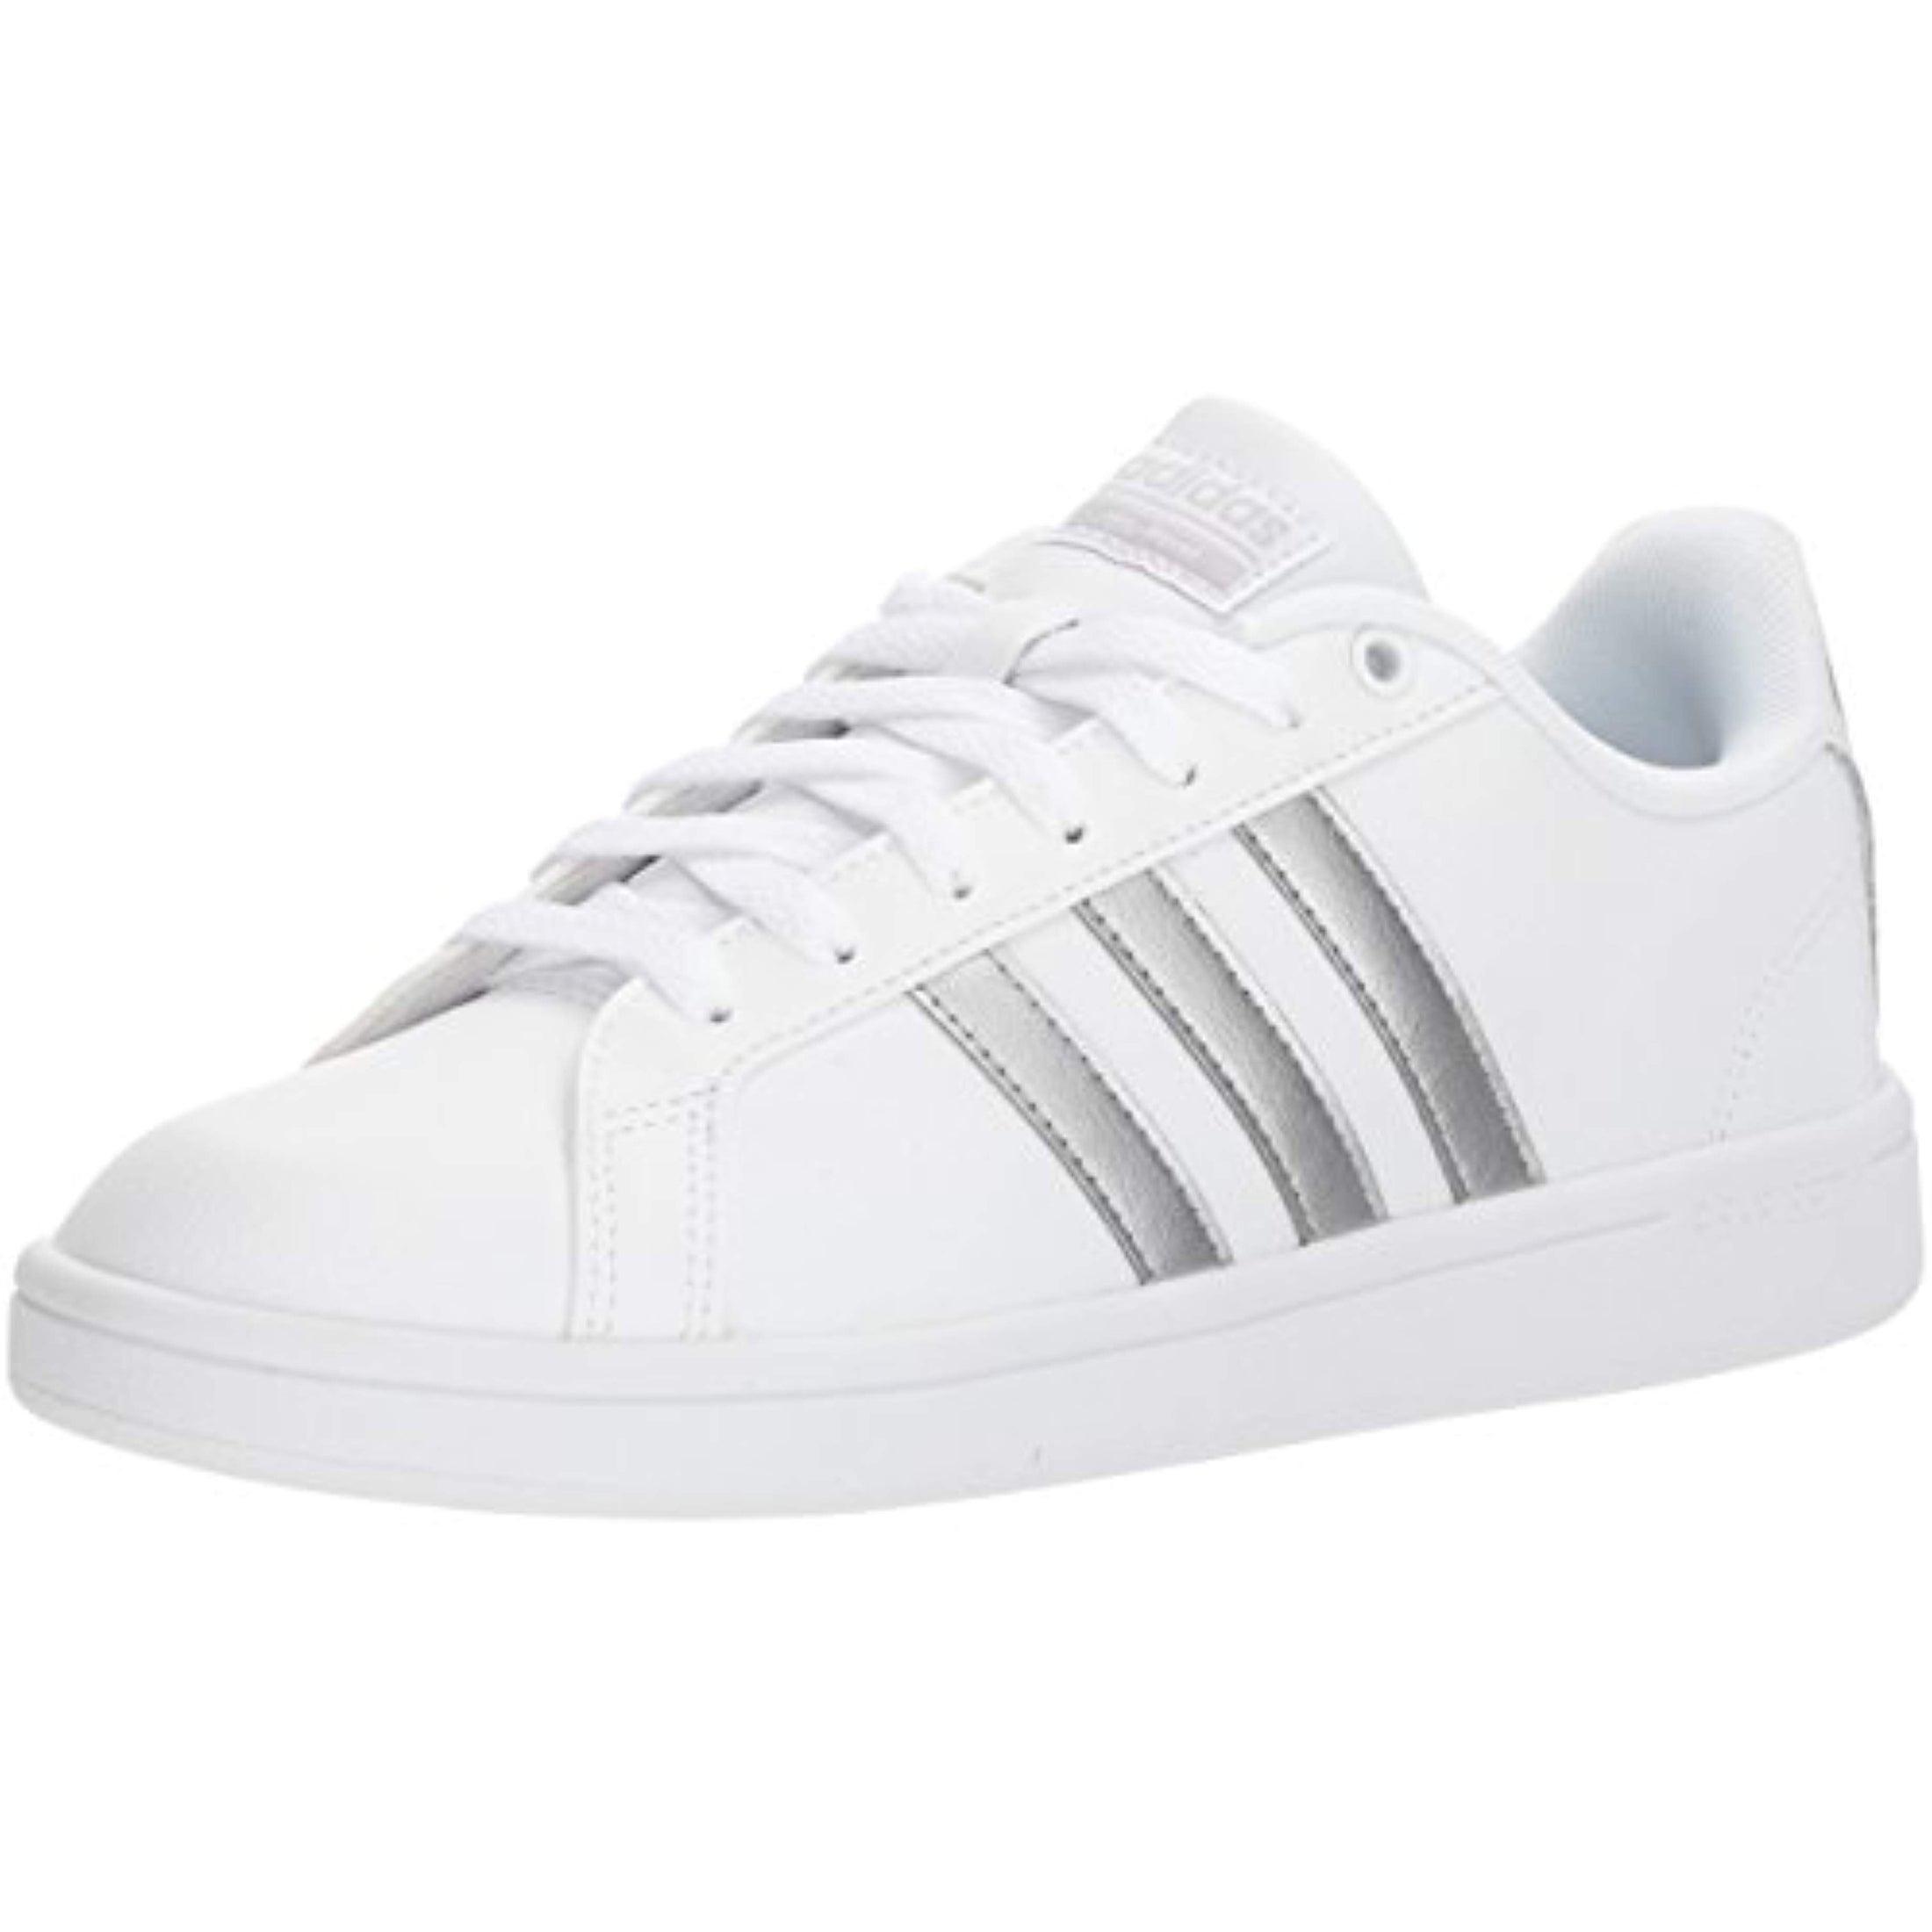 Shop Adidas Women's Cf Advantage